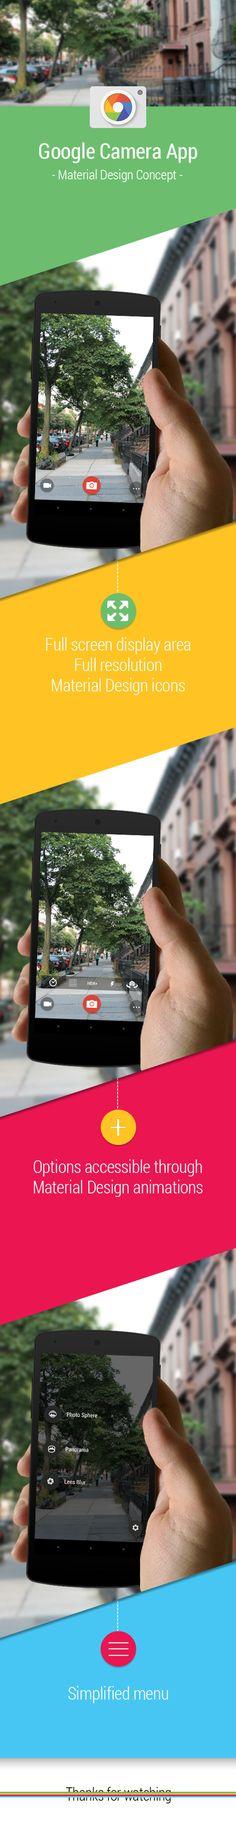 Google Camera app redesign on Behance